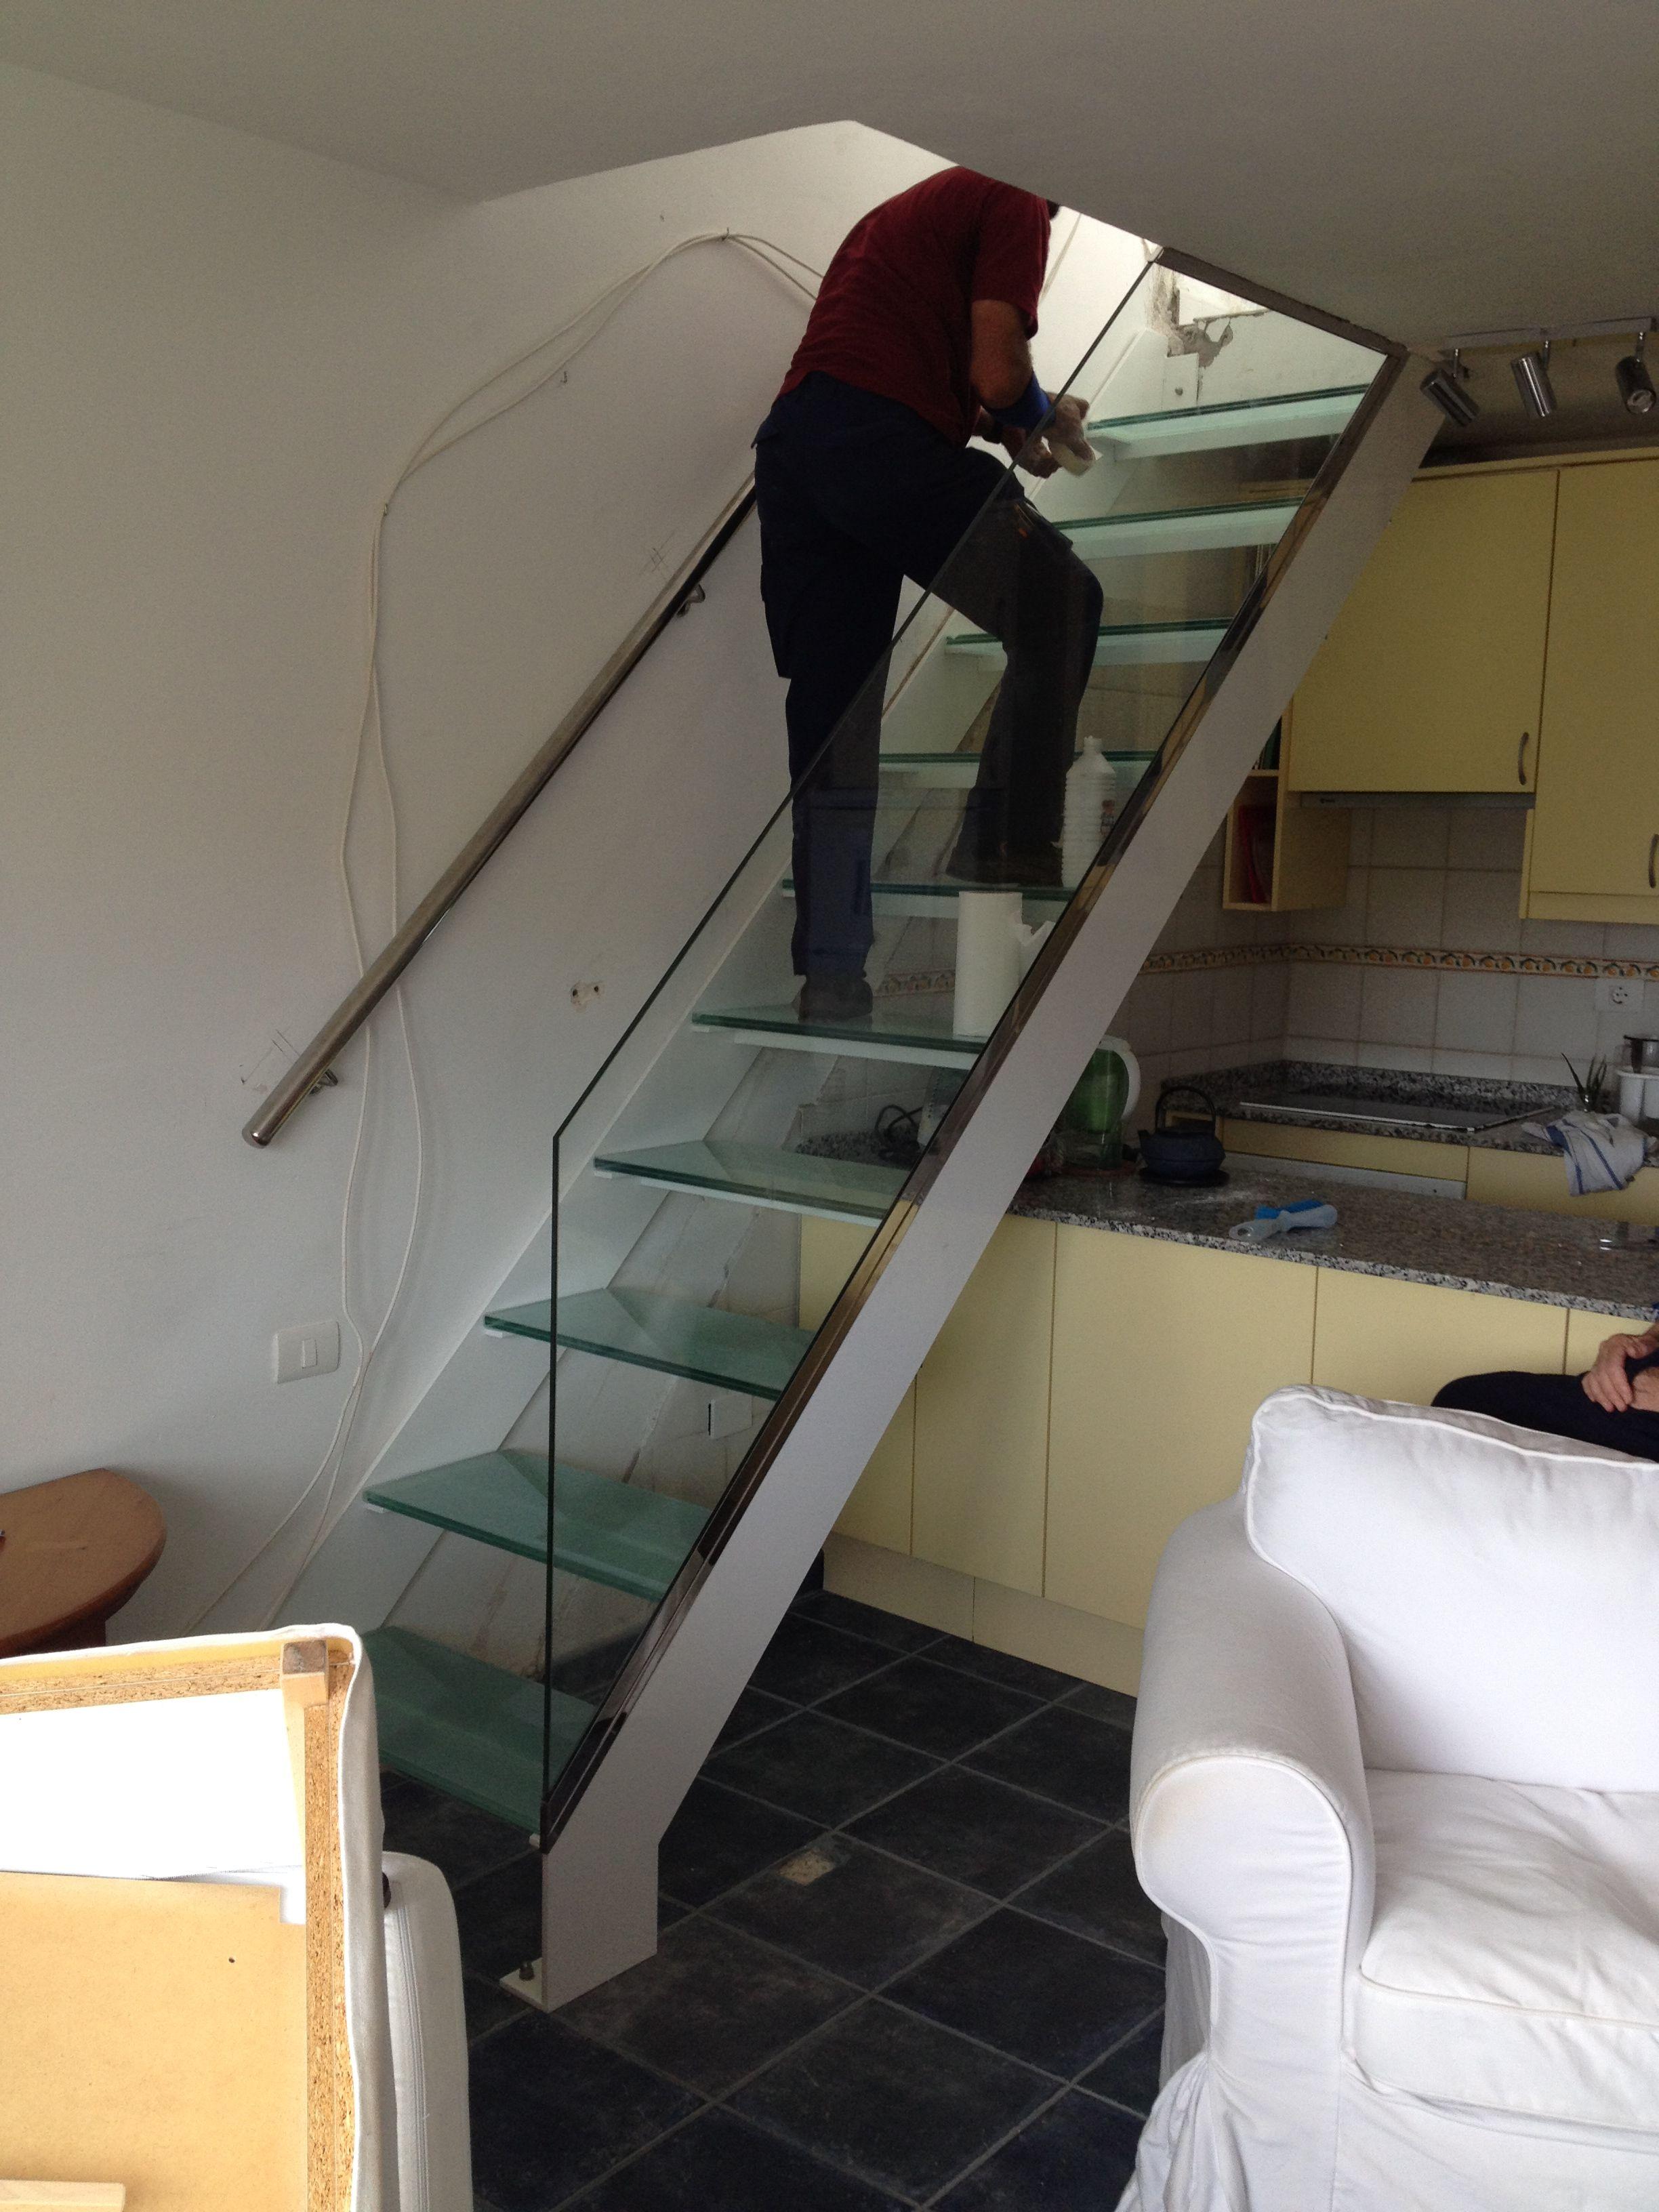 Escalera Cristal Good Volver With Escalera Cristal Escalera De  ~ Barandillas De Cristal Para Escaleras Interiores